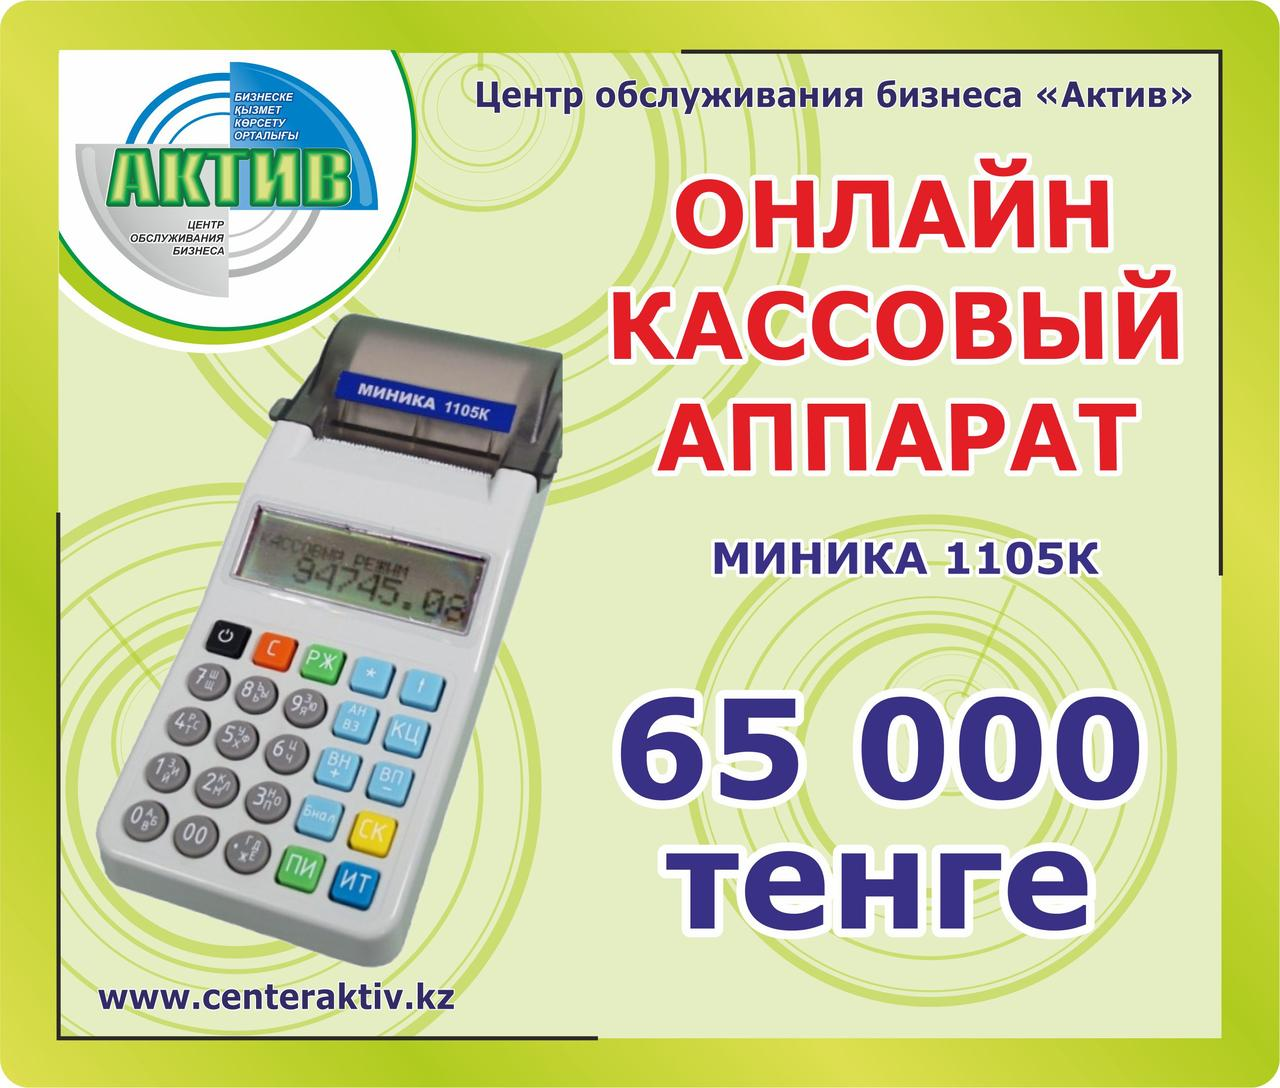 Кассовый аппарат онлайн Миника 1105 ФKZ